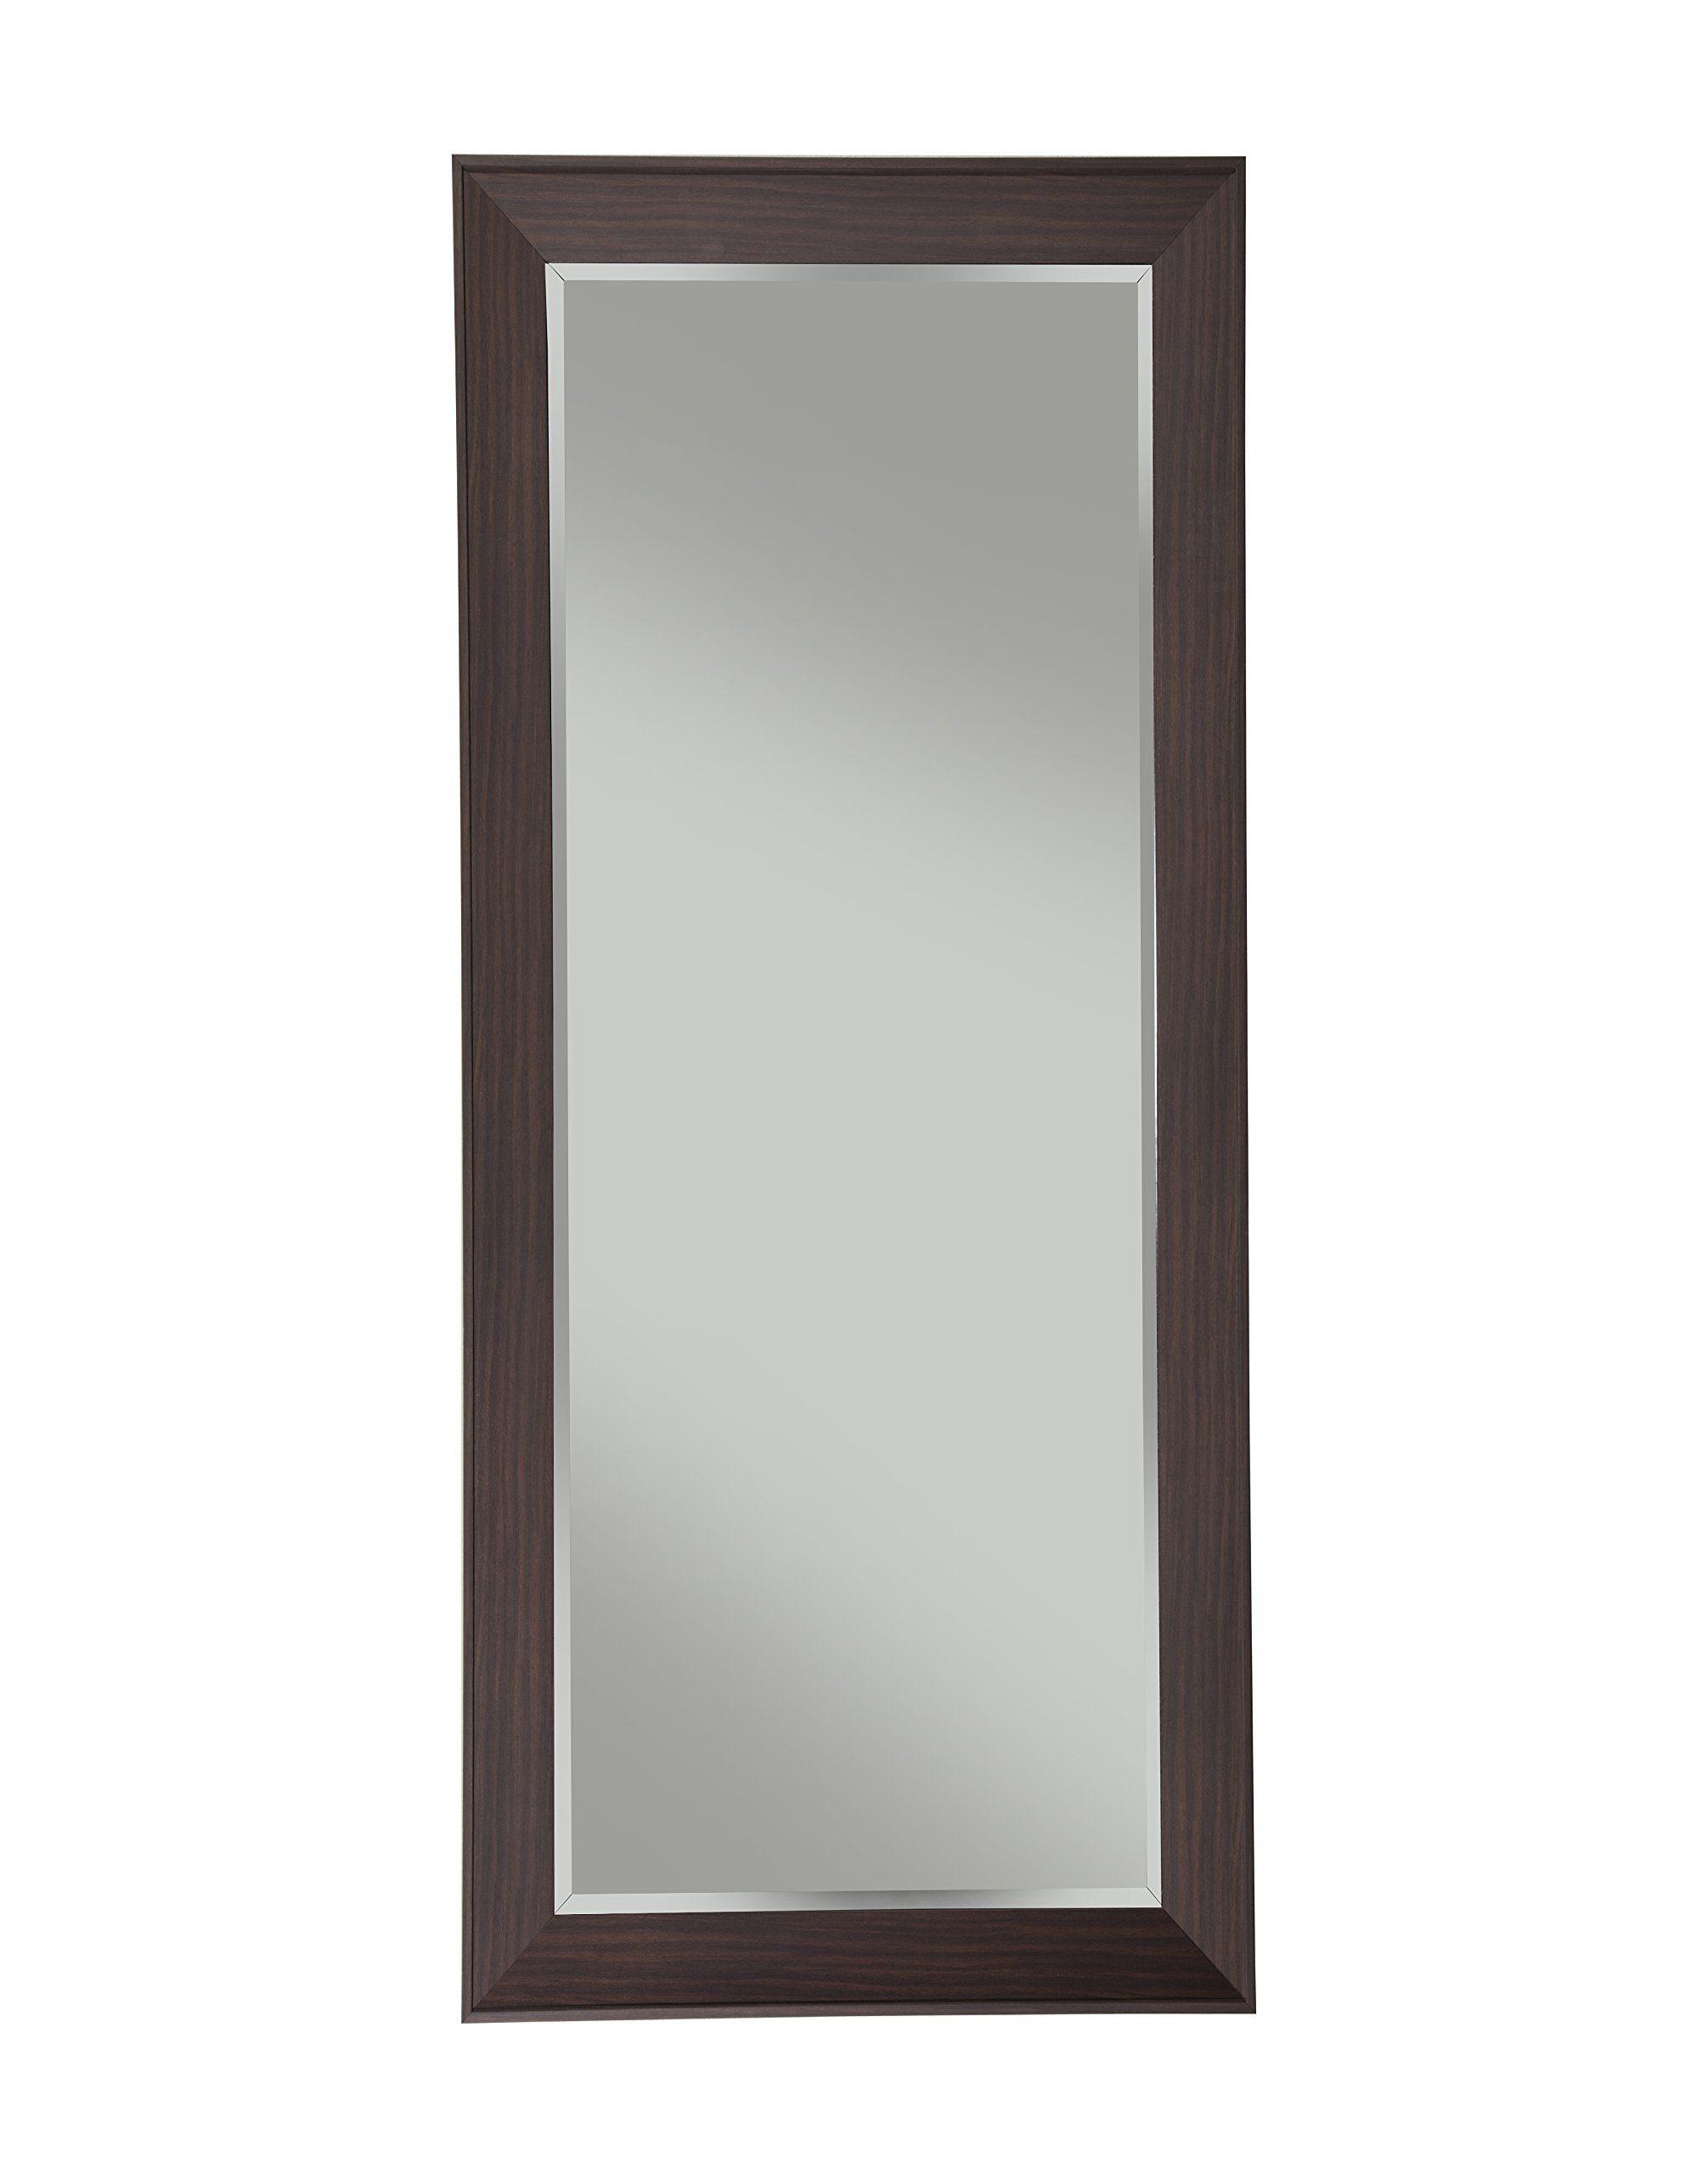 Sandberg Furniture Contemporary Full Length Leaner Mirror Espresso